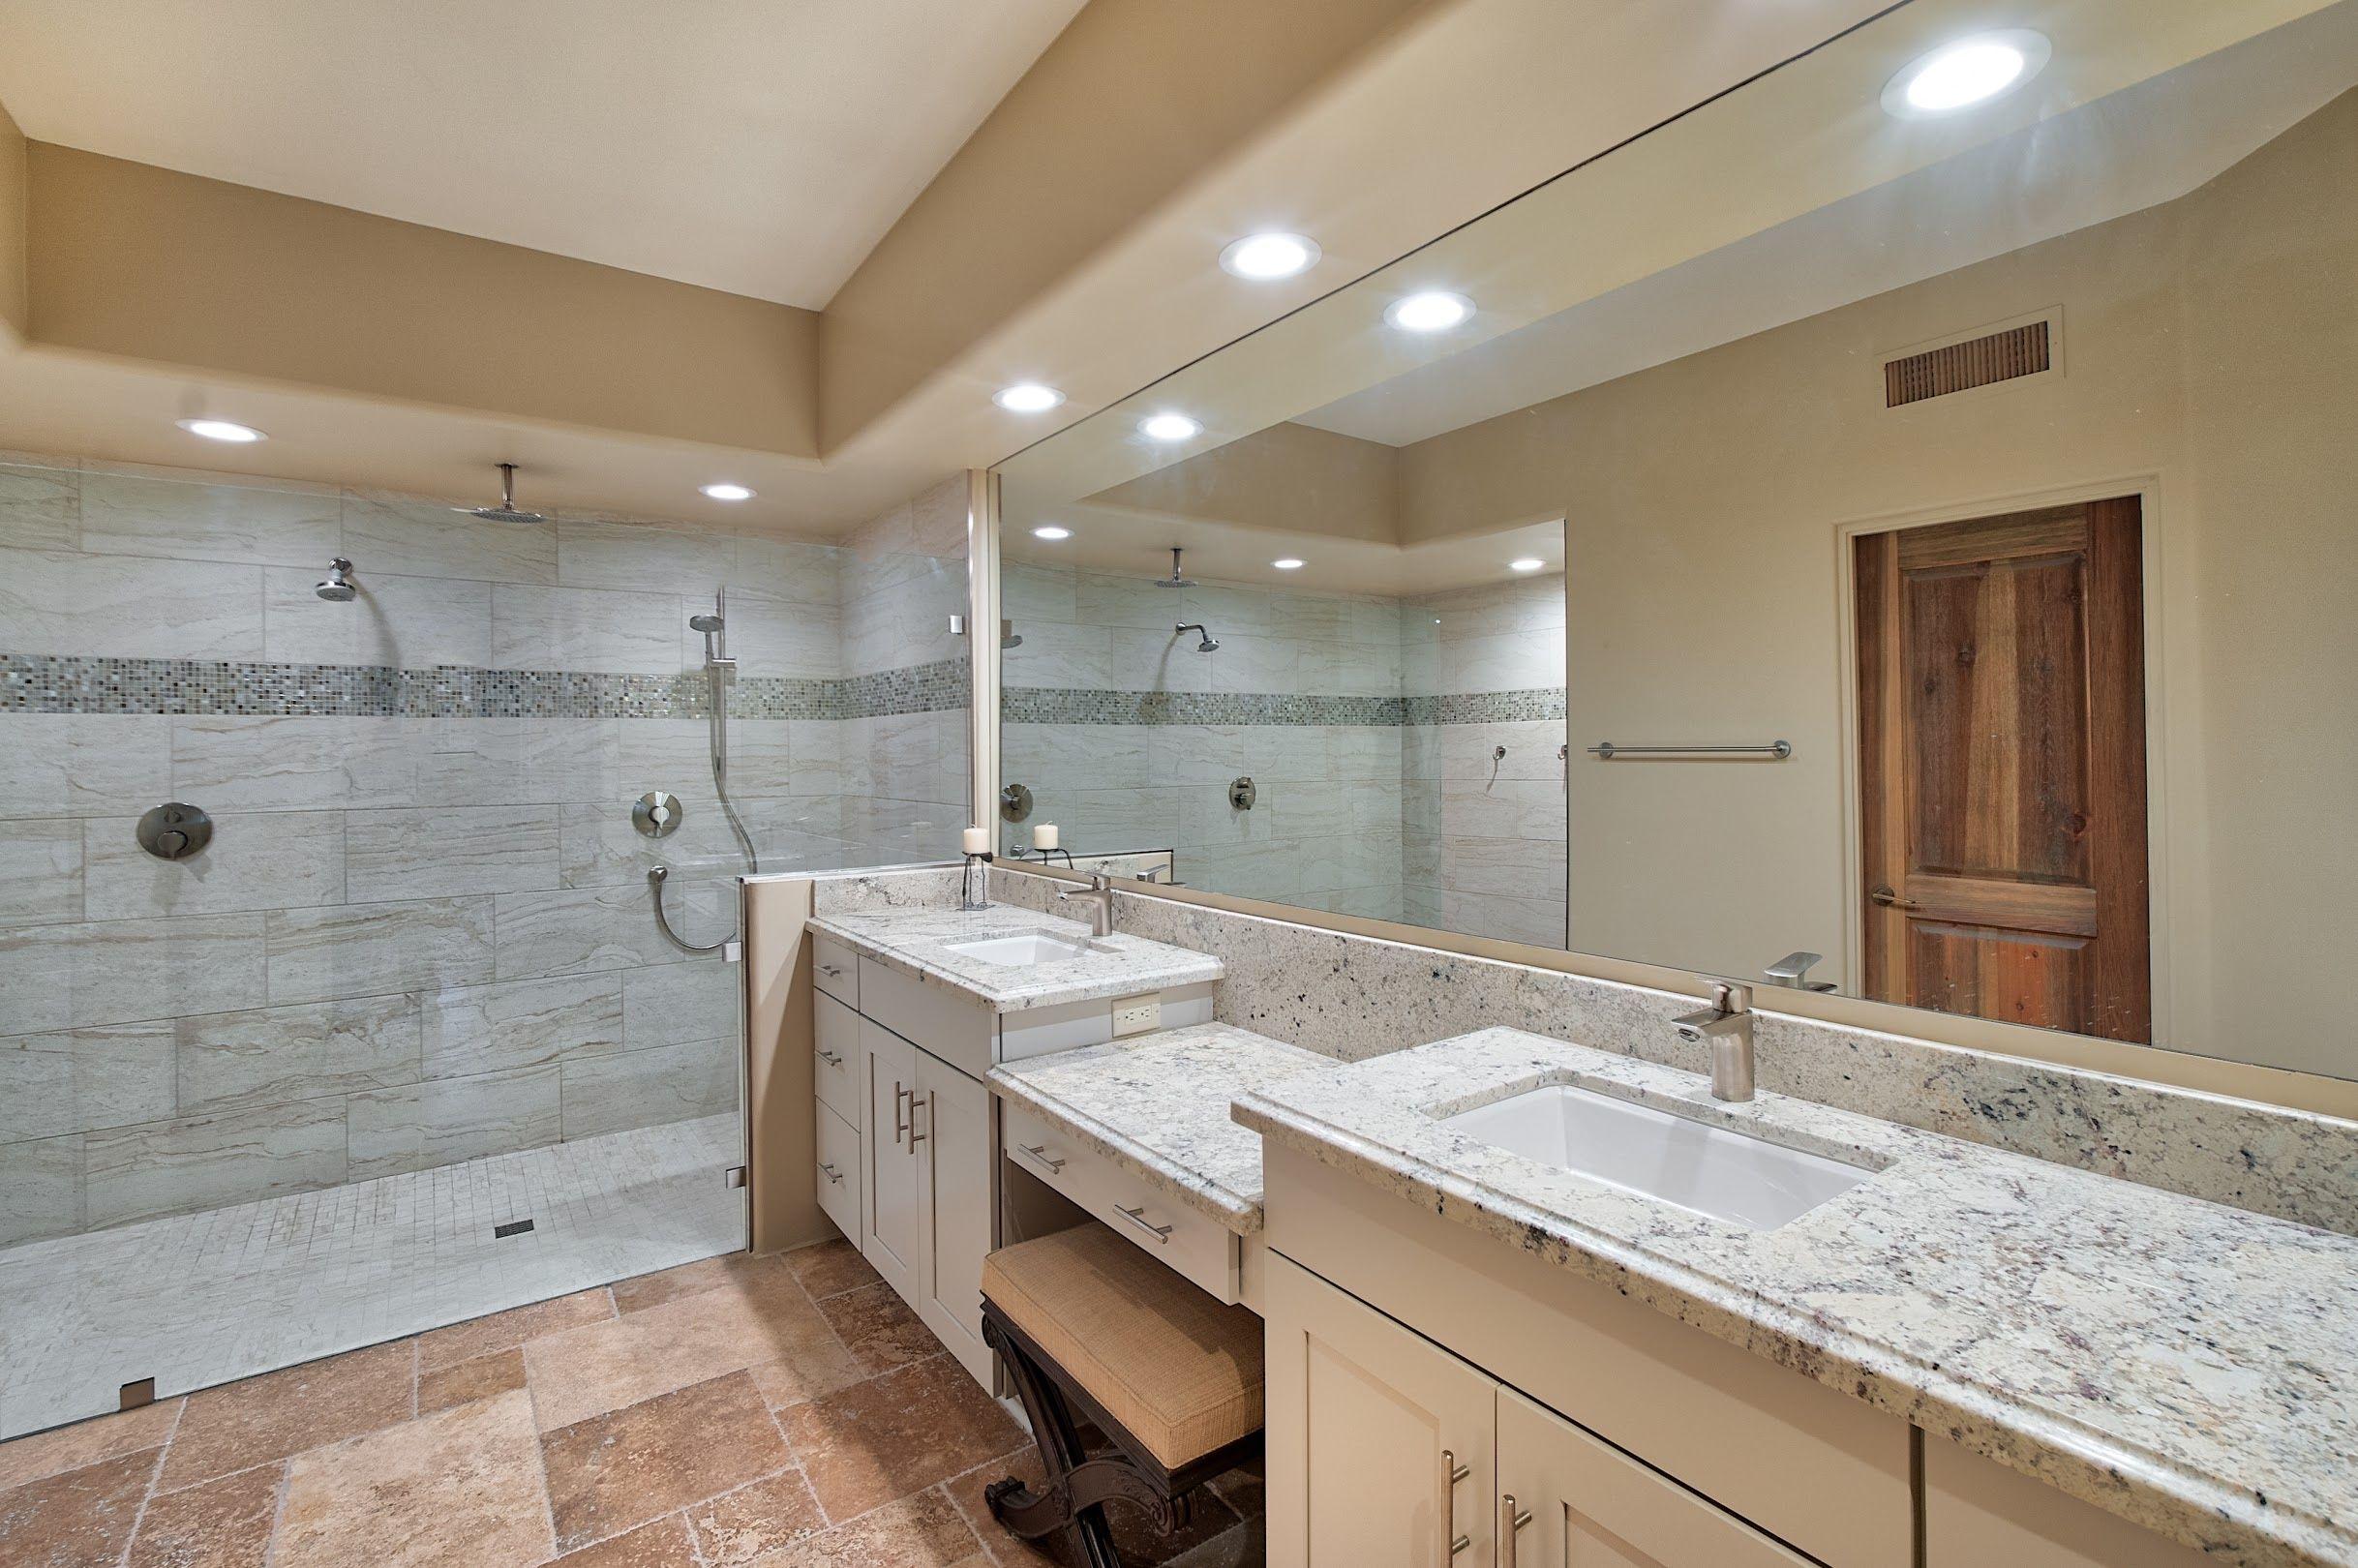 The Best Way To Predict The Future Is To Create It Bathroominspo Bathroomremodel Scottsdale Phoenix Ho Bathrooms Remodel Remodel Vacation Rental Design [ jpg ]